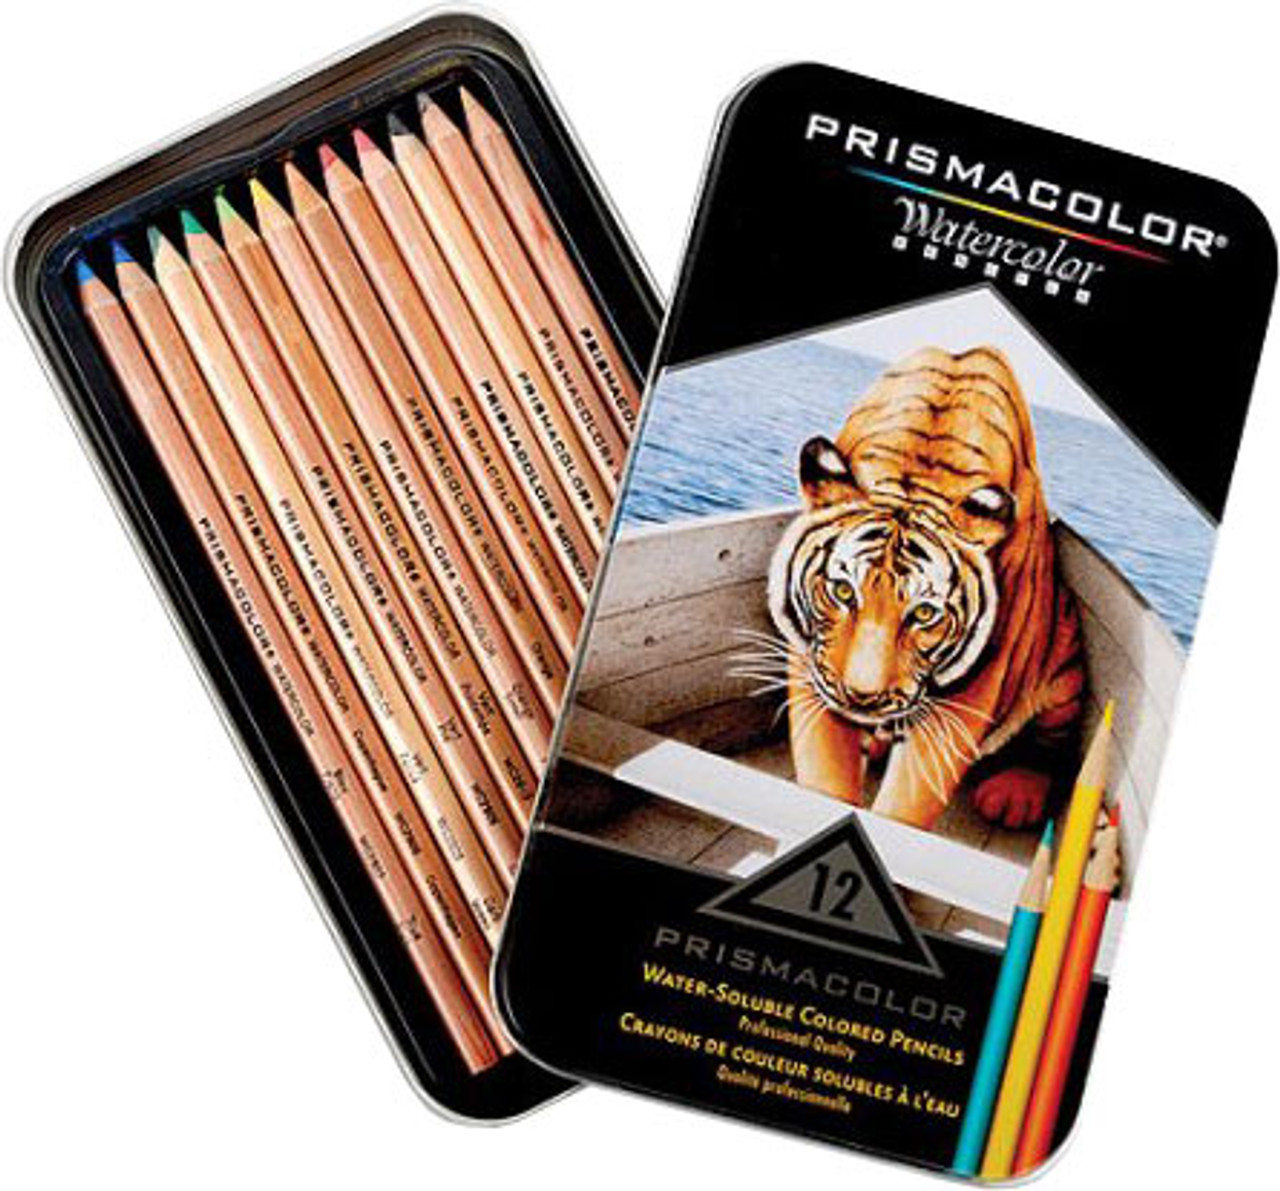 Prismacolor Watercolor Pencil 12set